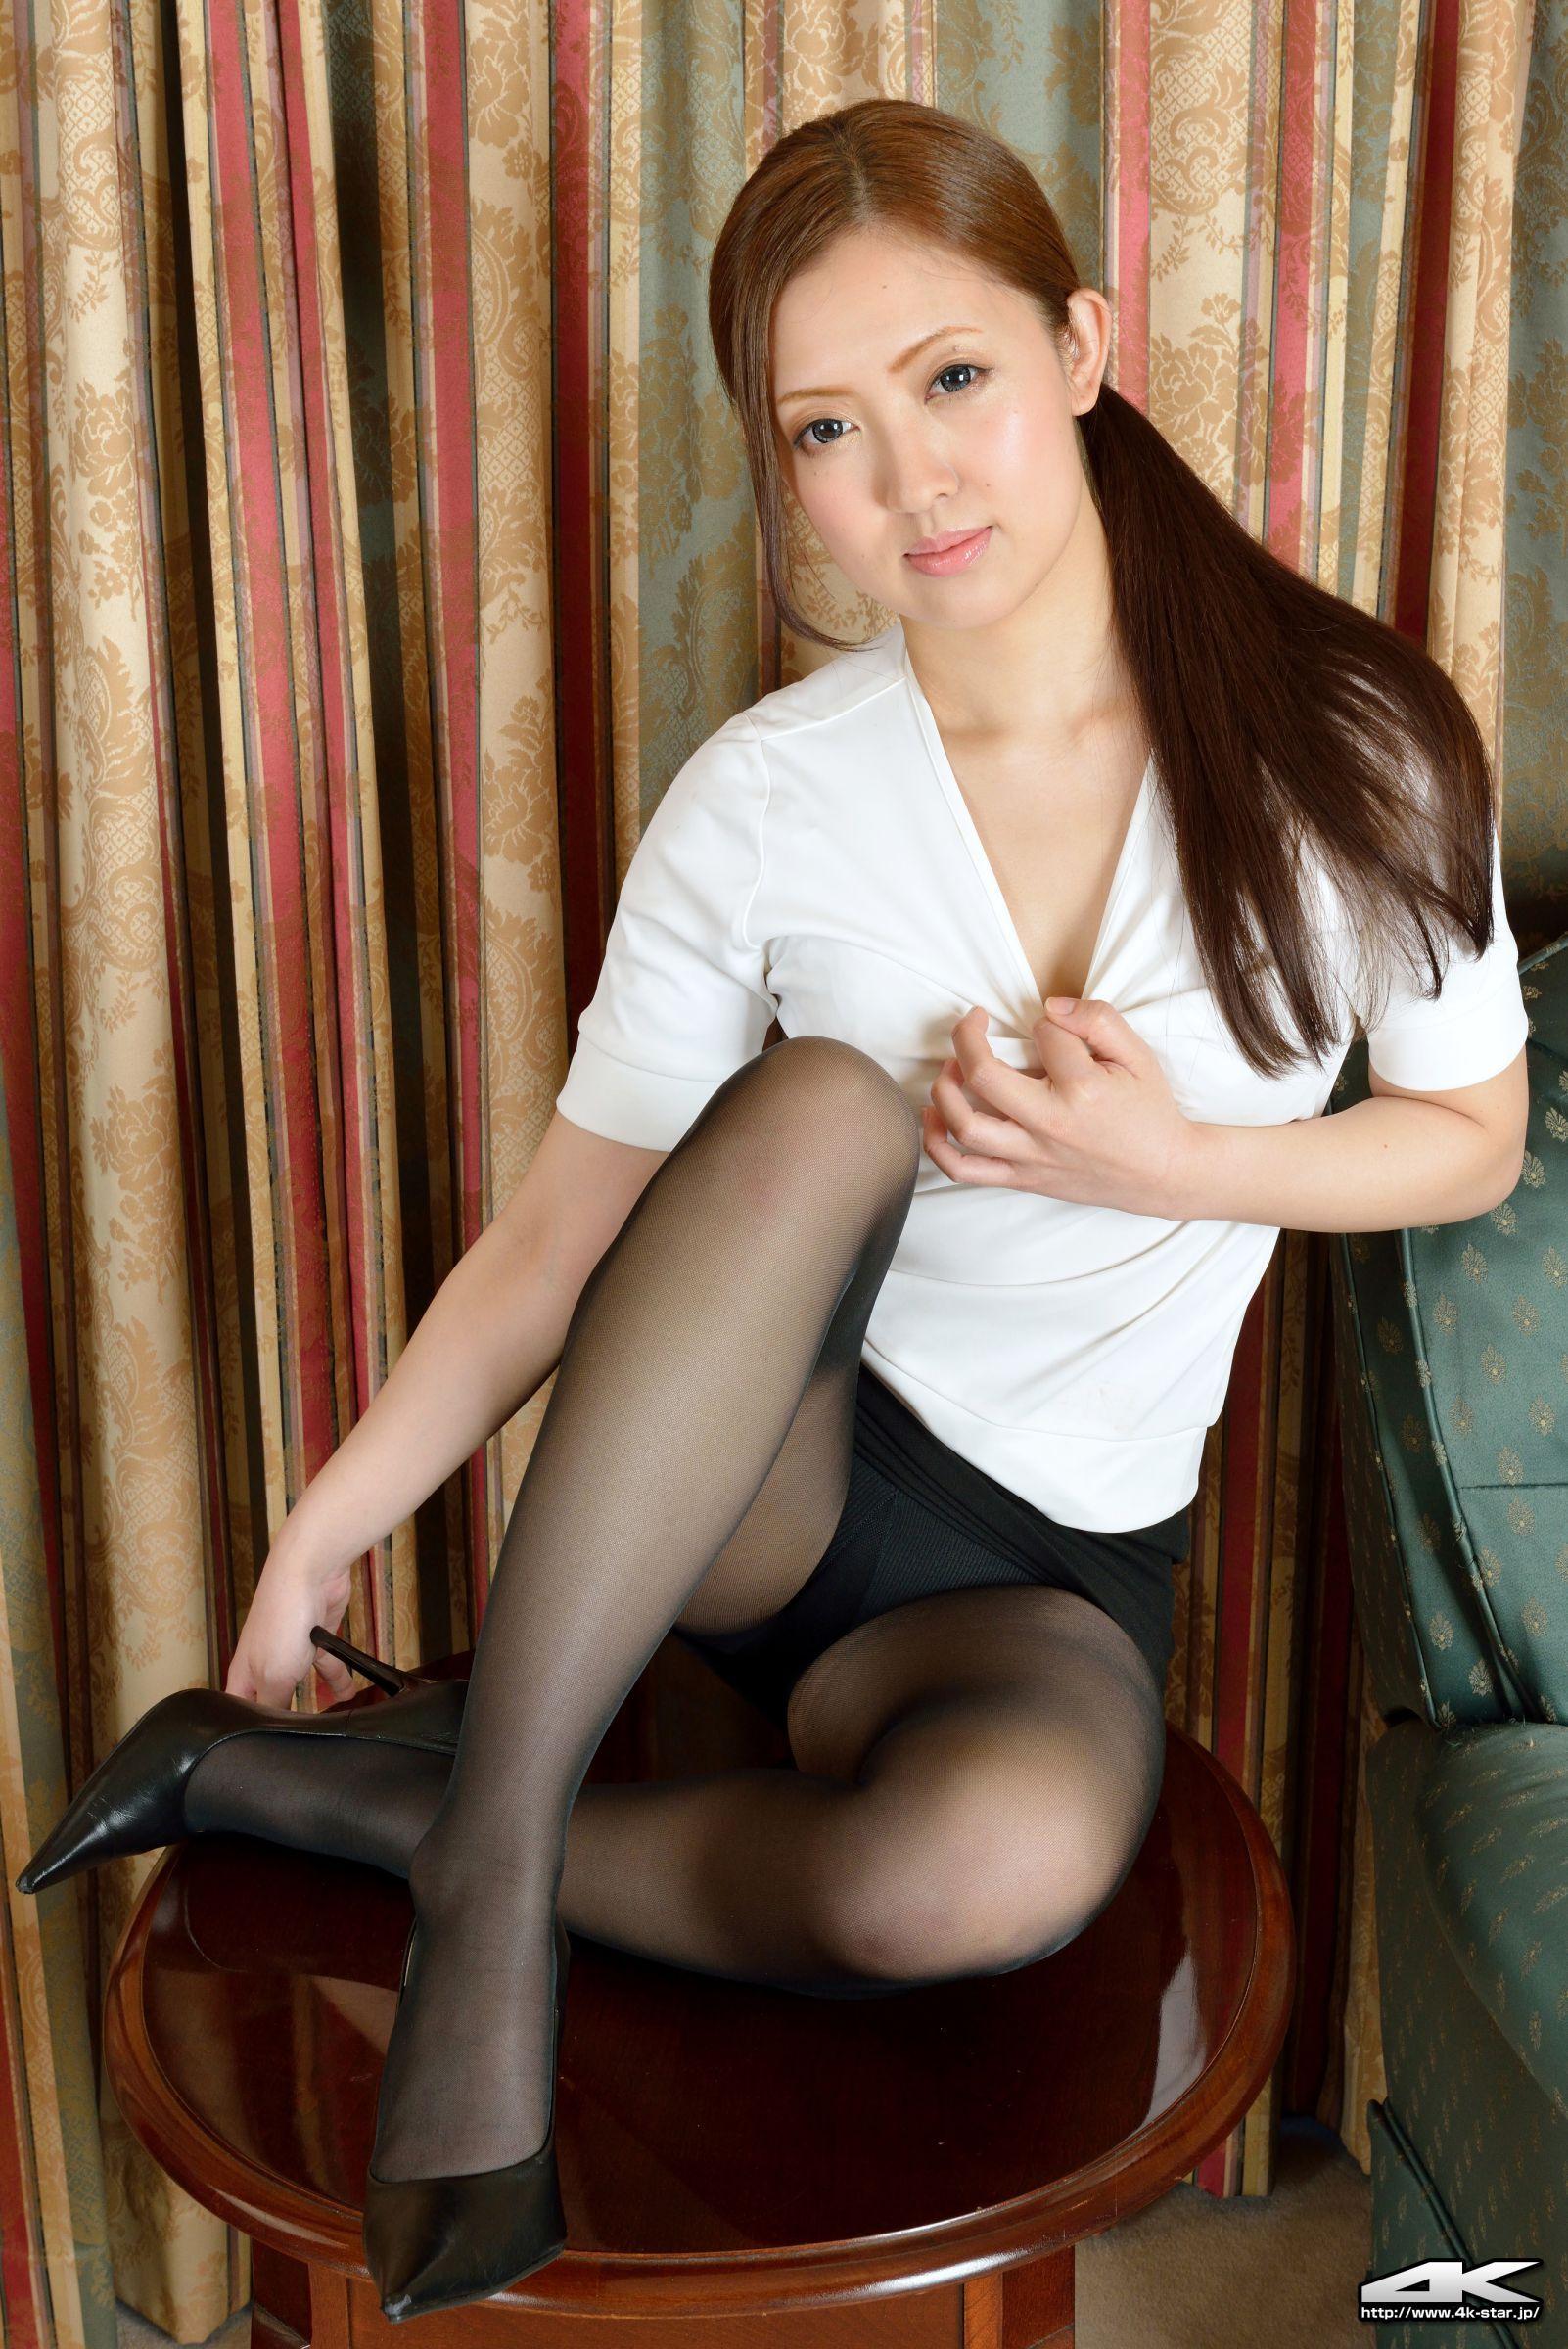 [4K-STAR写真] No.00330 藍澤瑠璃 Office Lady 套图 日本美女 少妇 OL 制服 长腿 ...